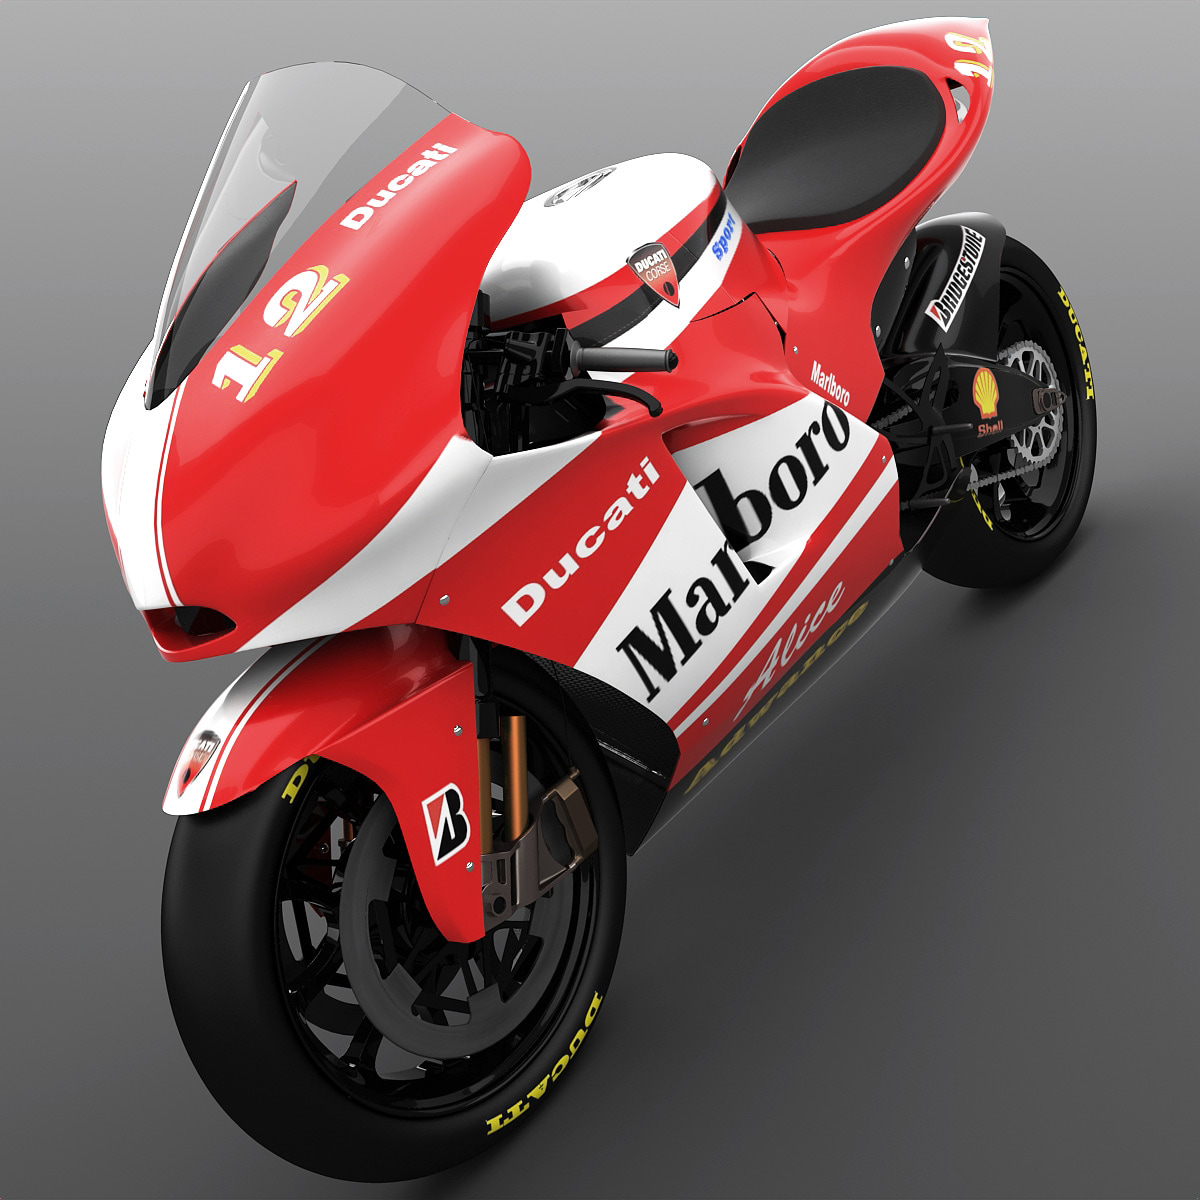 Dantin_Pramac_Ducati_GP4_002.jpg